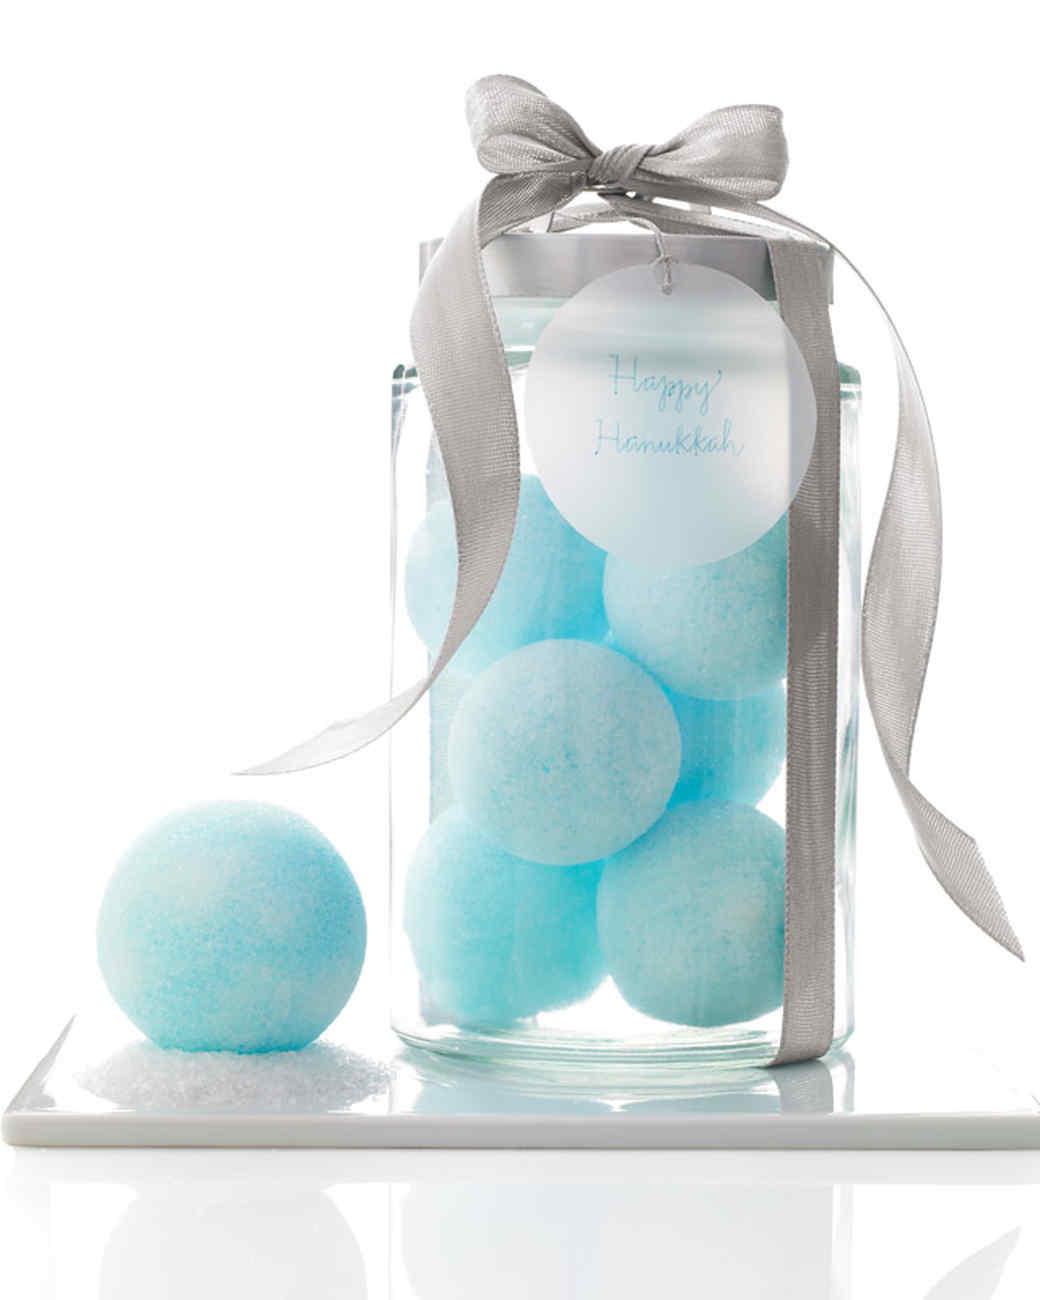 mld104247_1208_snowballs.jpg